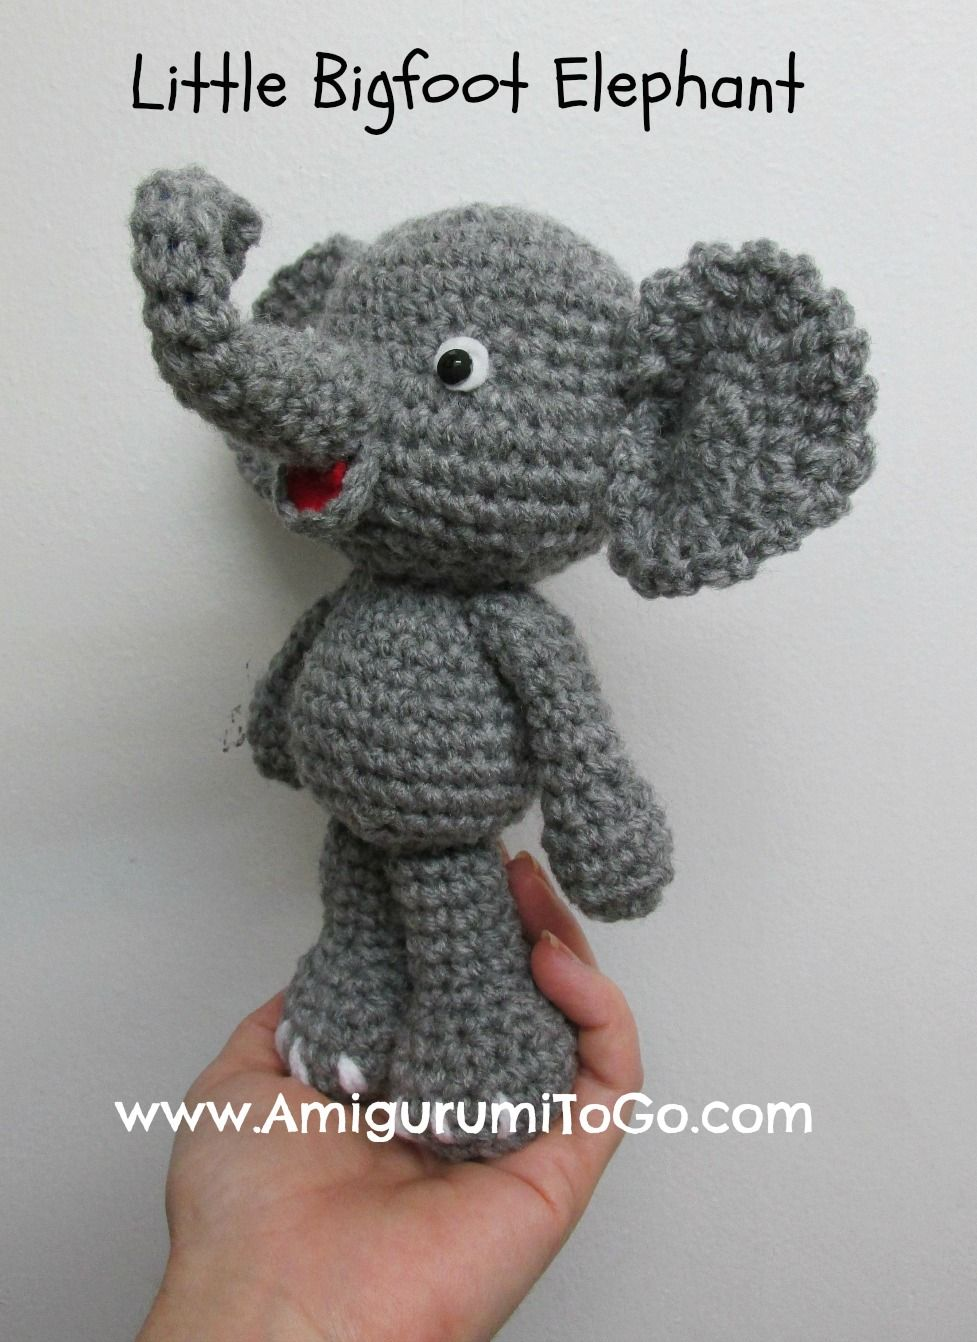 Amigurumi To Go Cute Elephant Video Tutorial In The Works